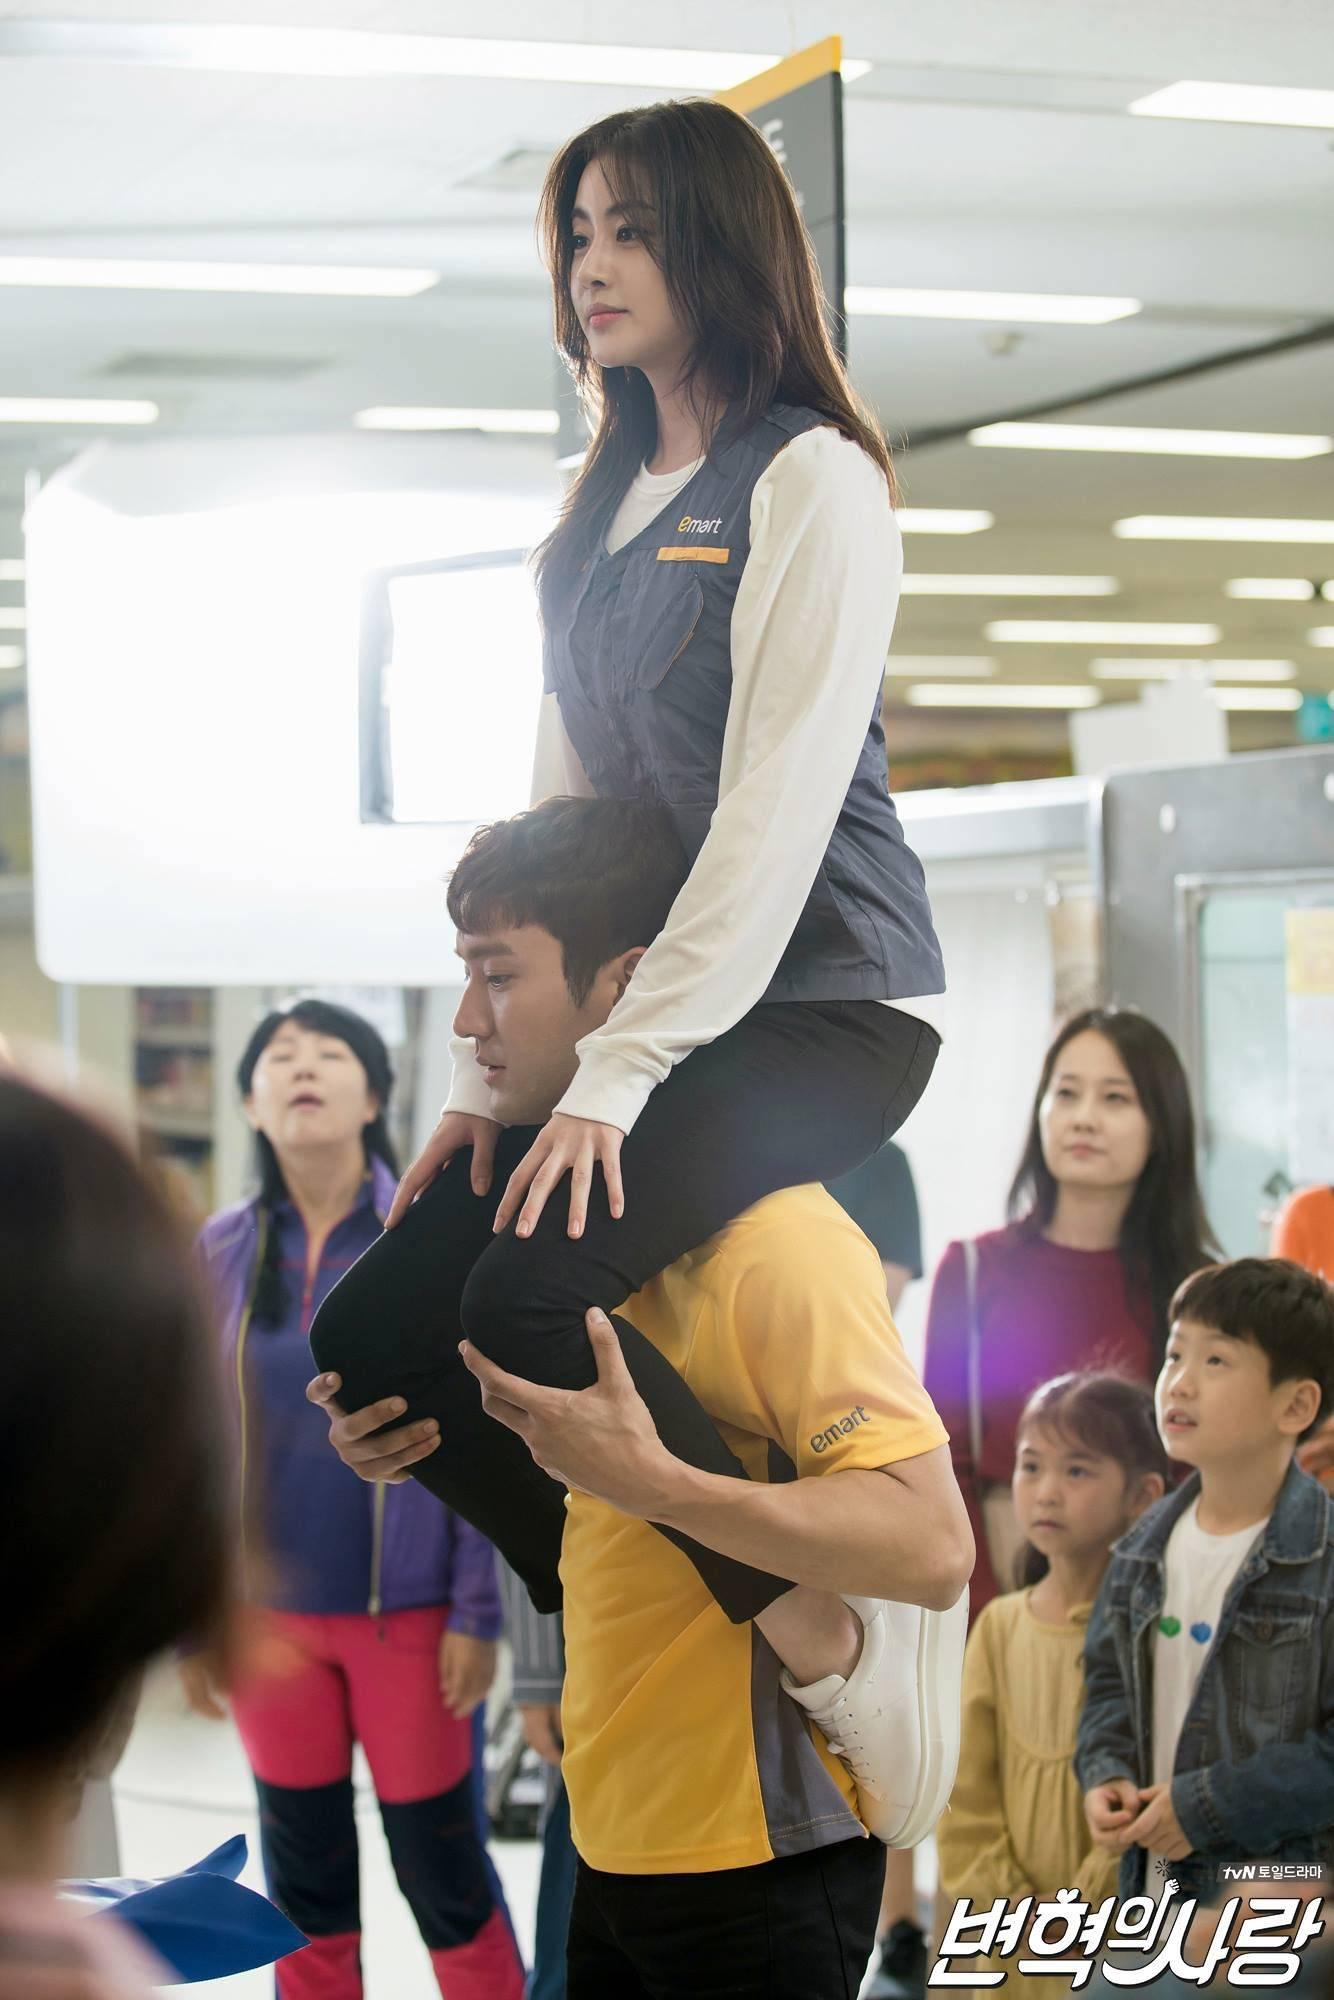 Revolutionary Love (Korean Drama - 2017) - 변혁의 사랑